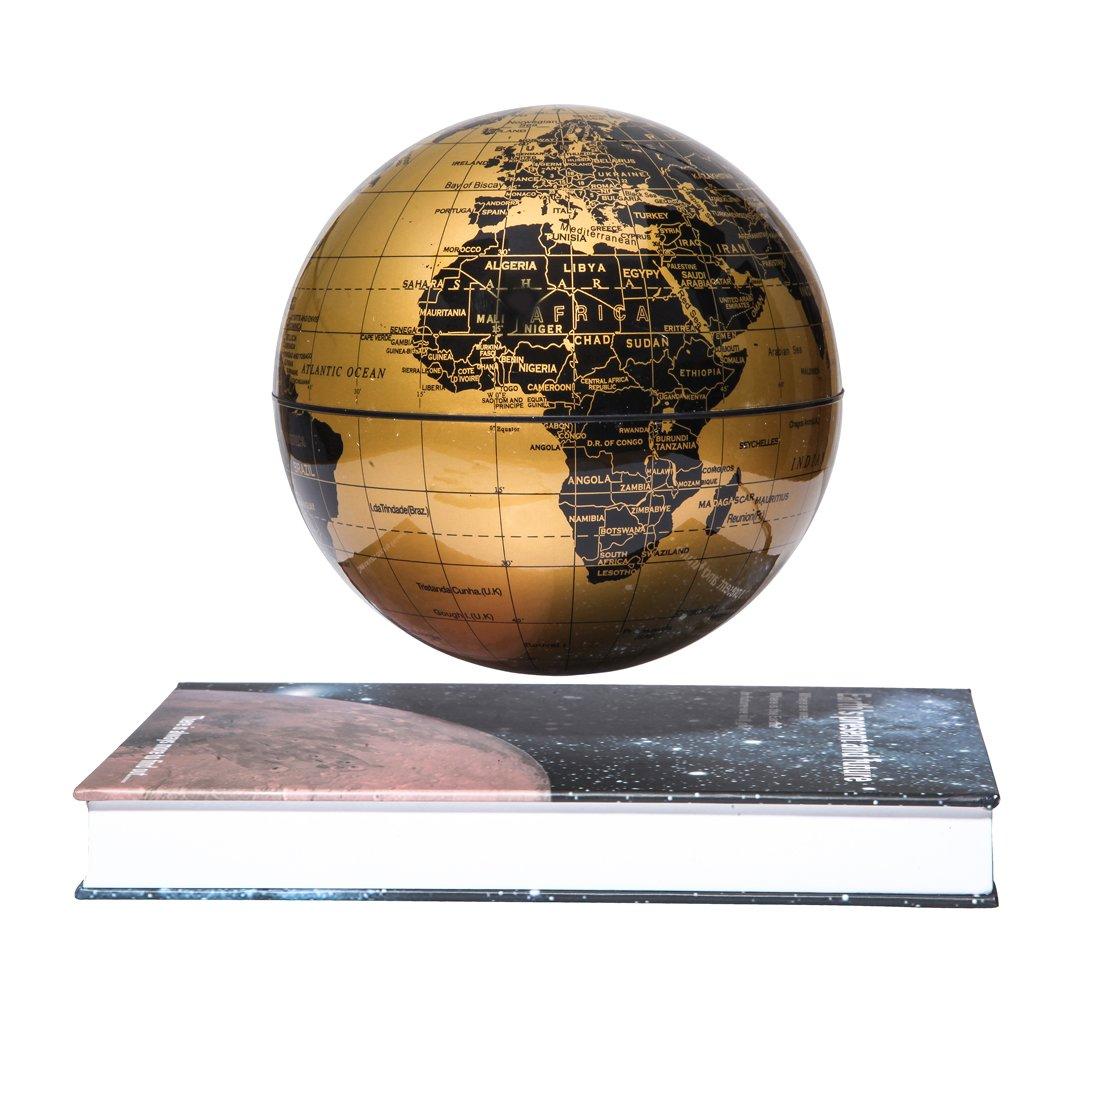 woodlev Magnetic Maglev Levitation Levitron Floating Rotating 6'' Globe Gold & Blue Book Style Platform Learning Education Home Decor (Gold)